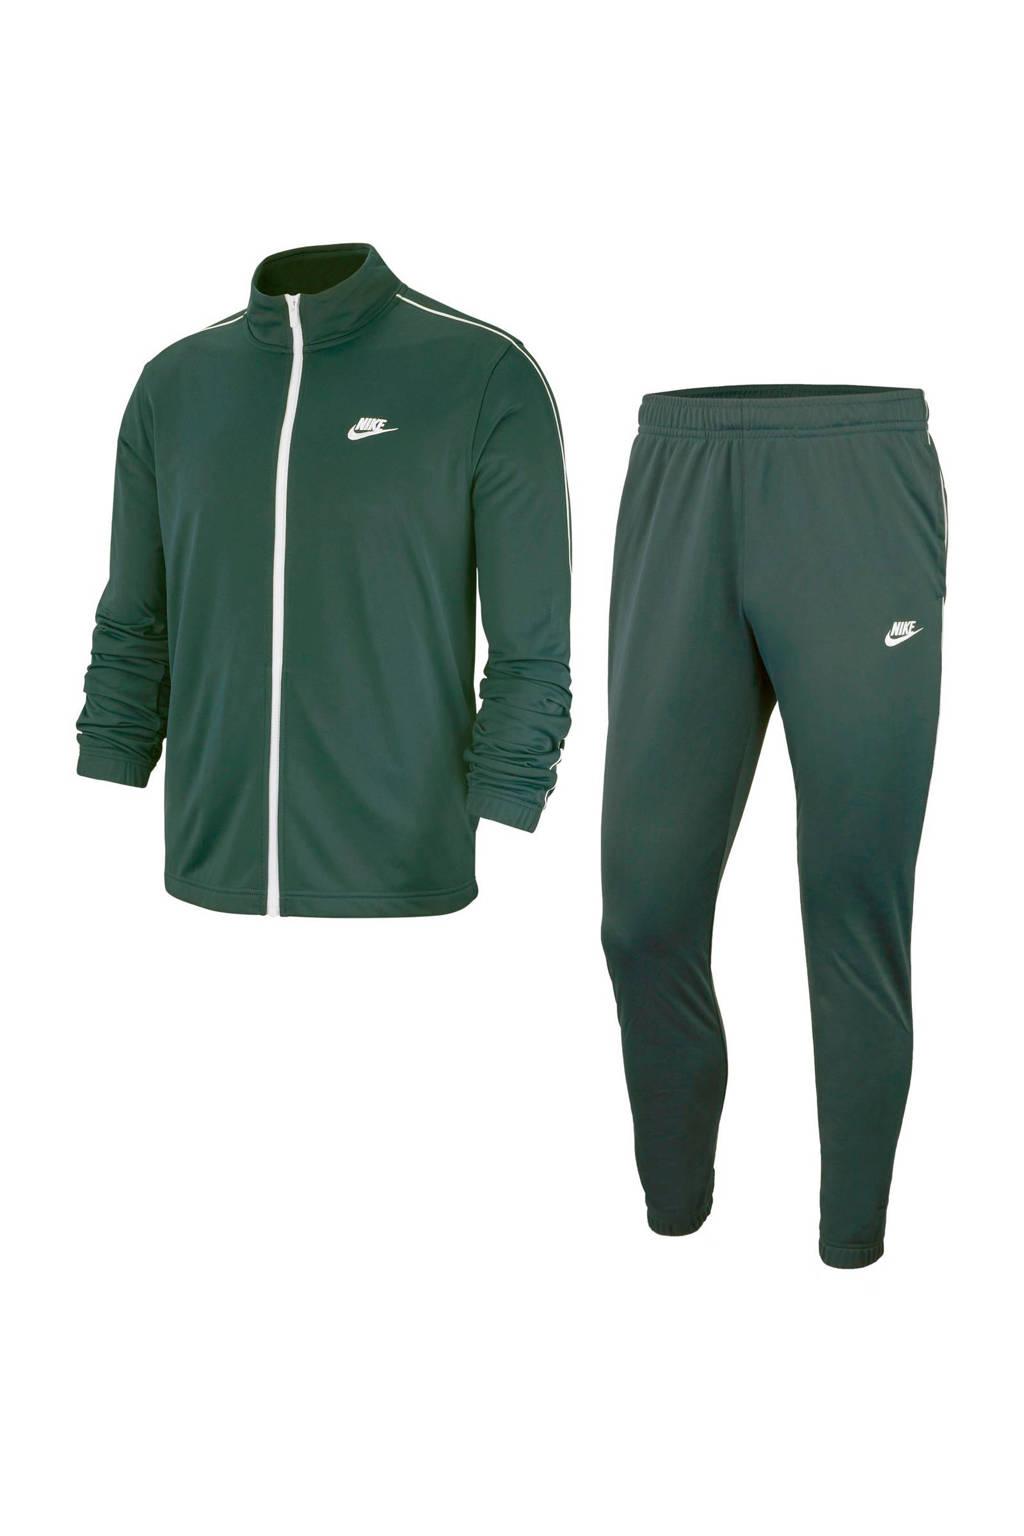 Nike   trainingspak groen, Donkergroen/wit